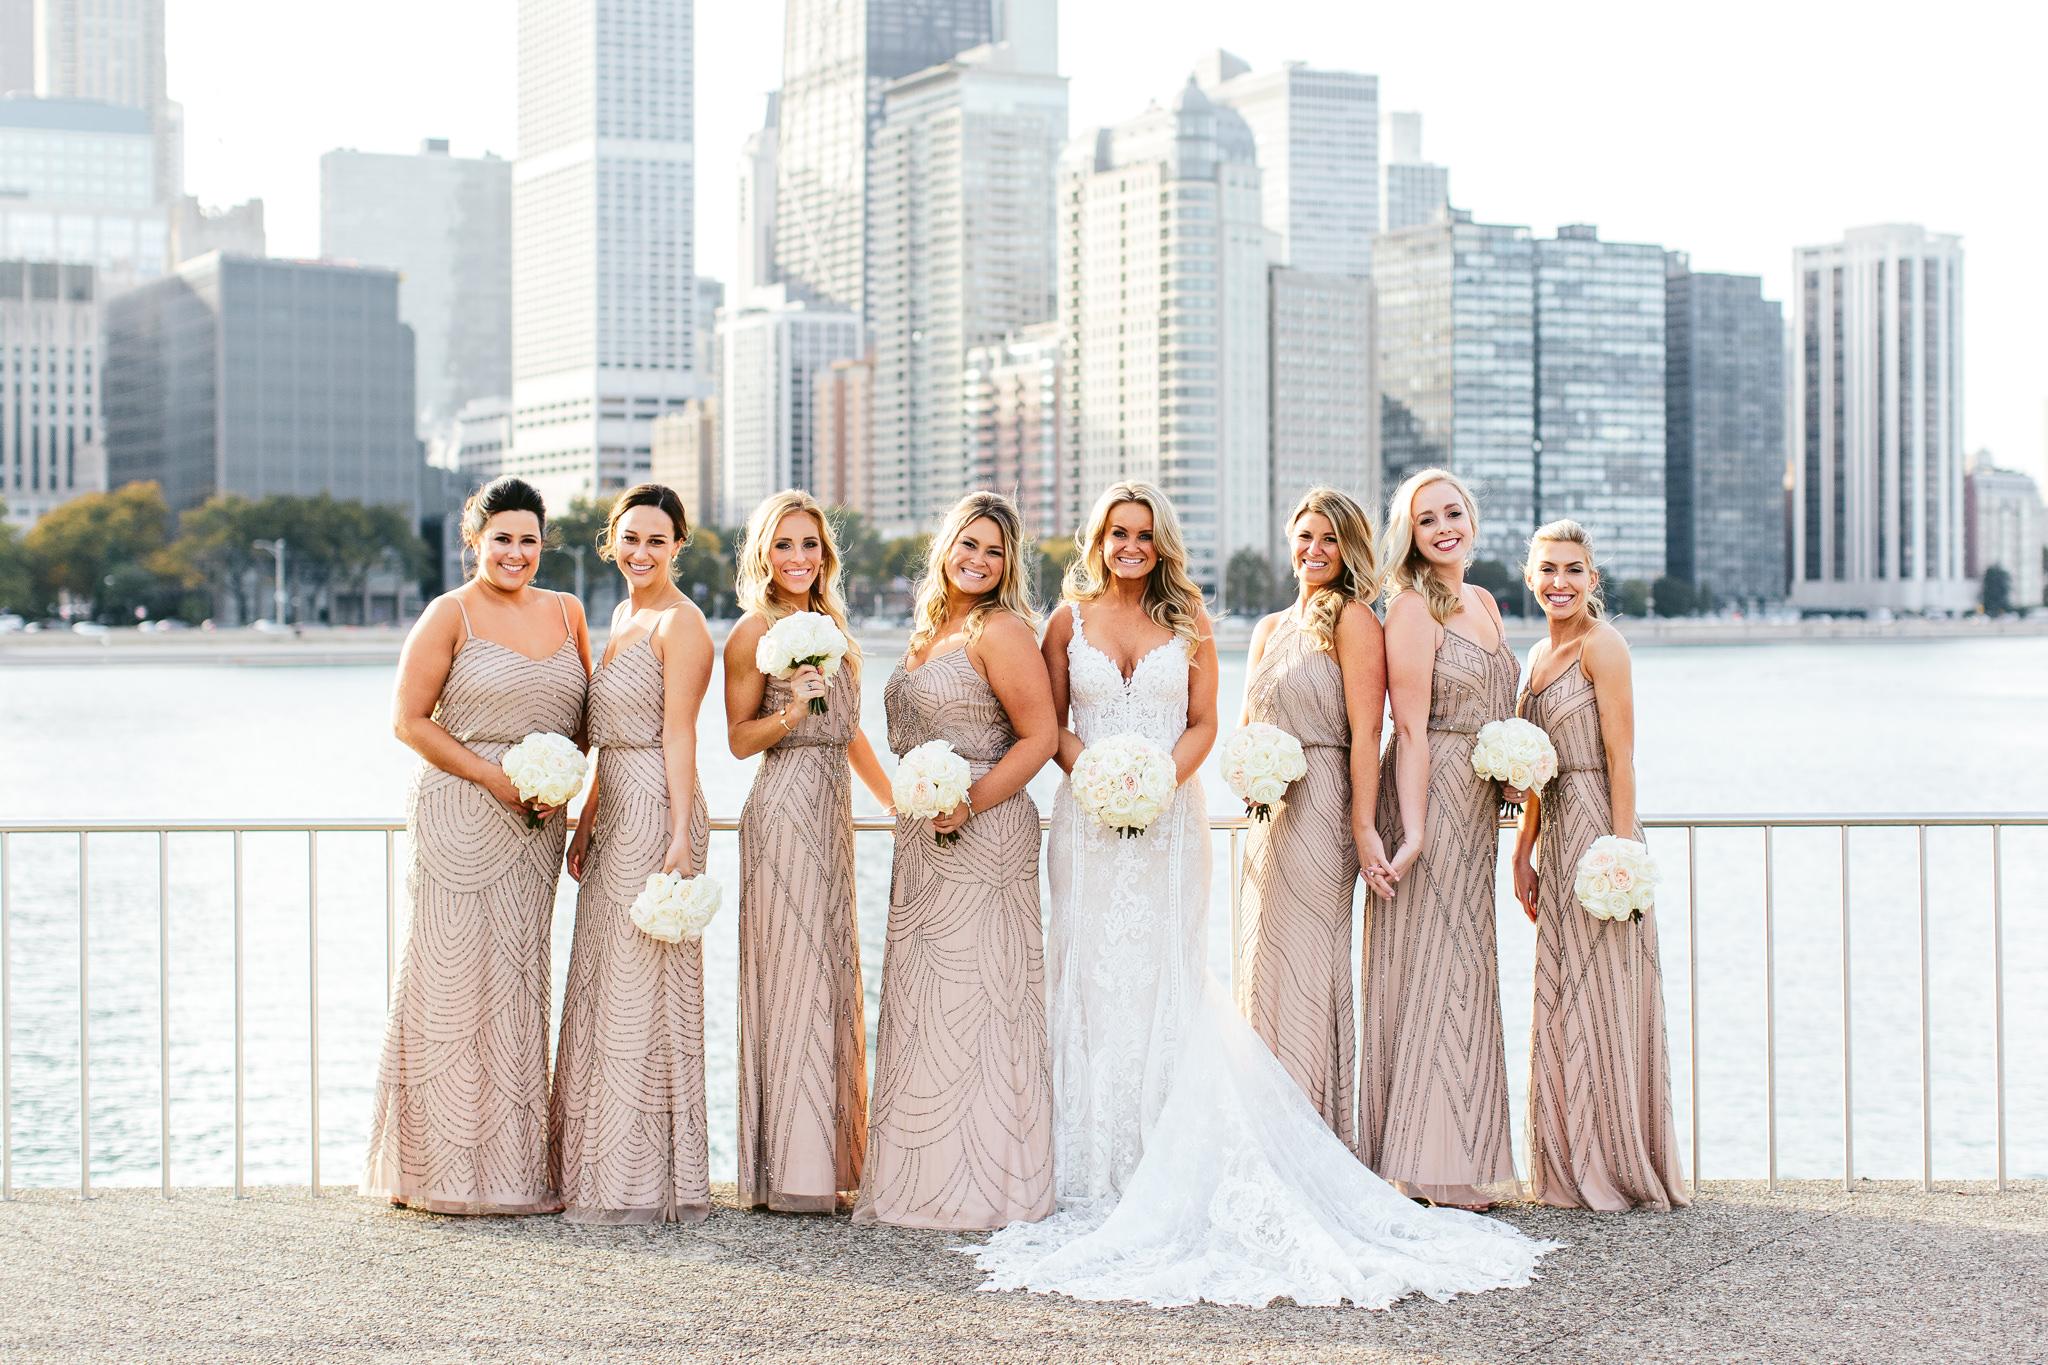 1-nicodem-creative-chicago-wedding-photography-videography-inspi